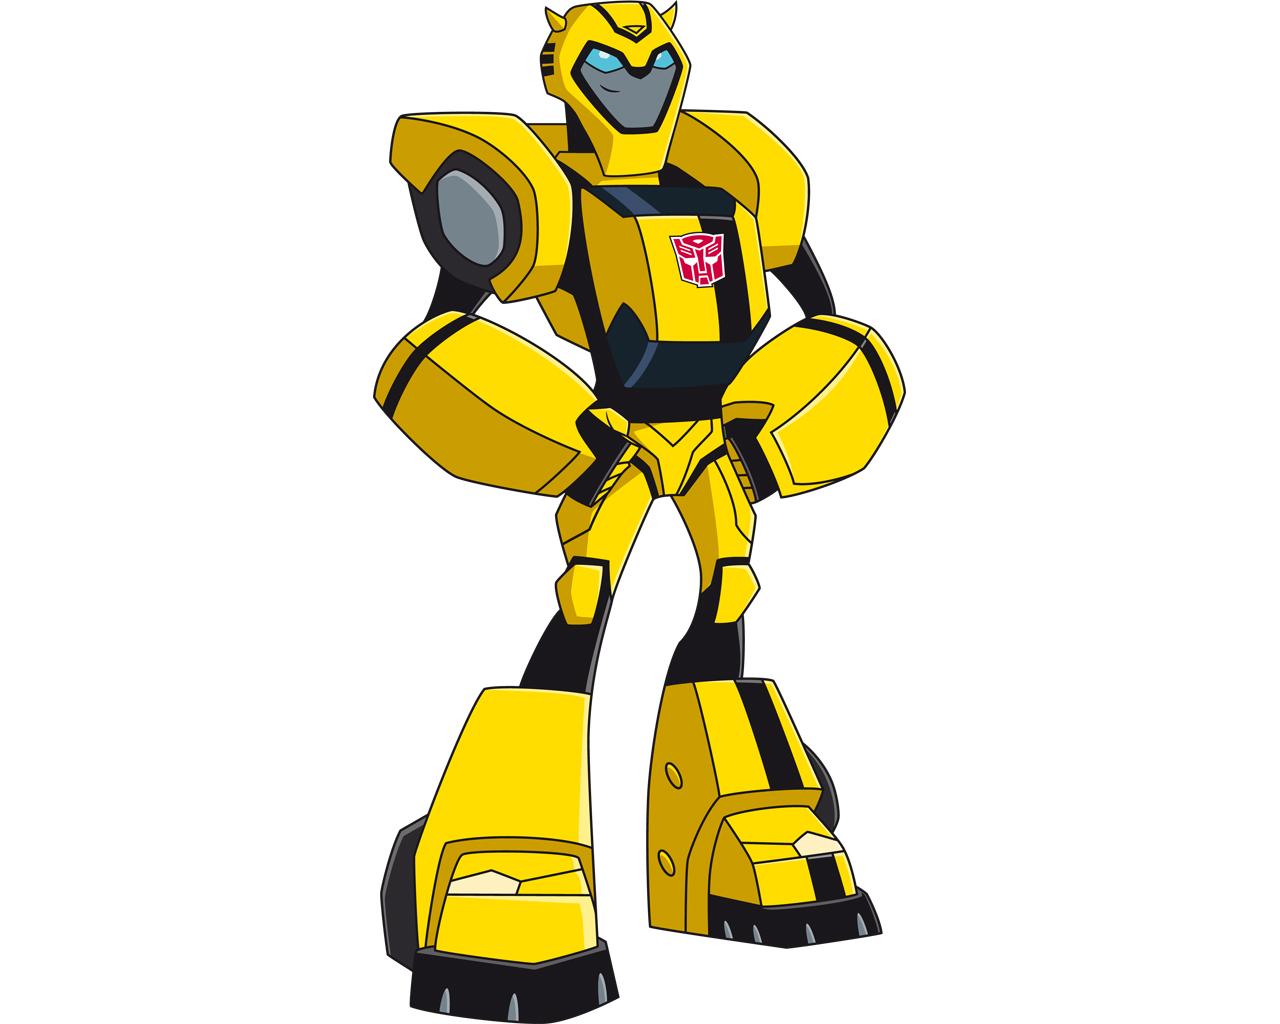 Transformers clipart Panda Images transformer%20clipart Clipart Transformer